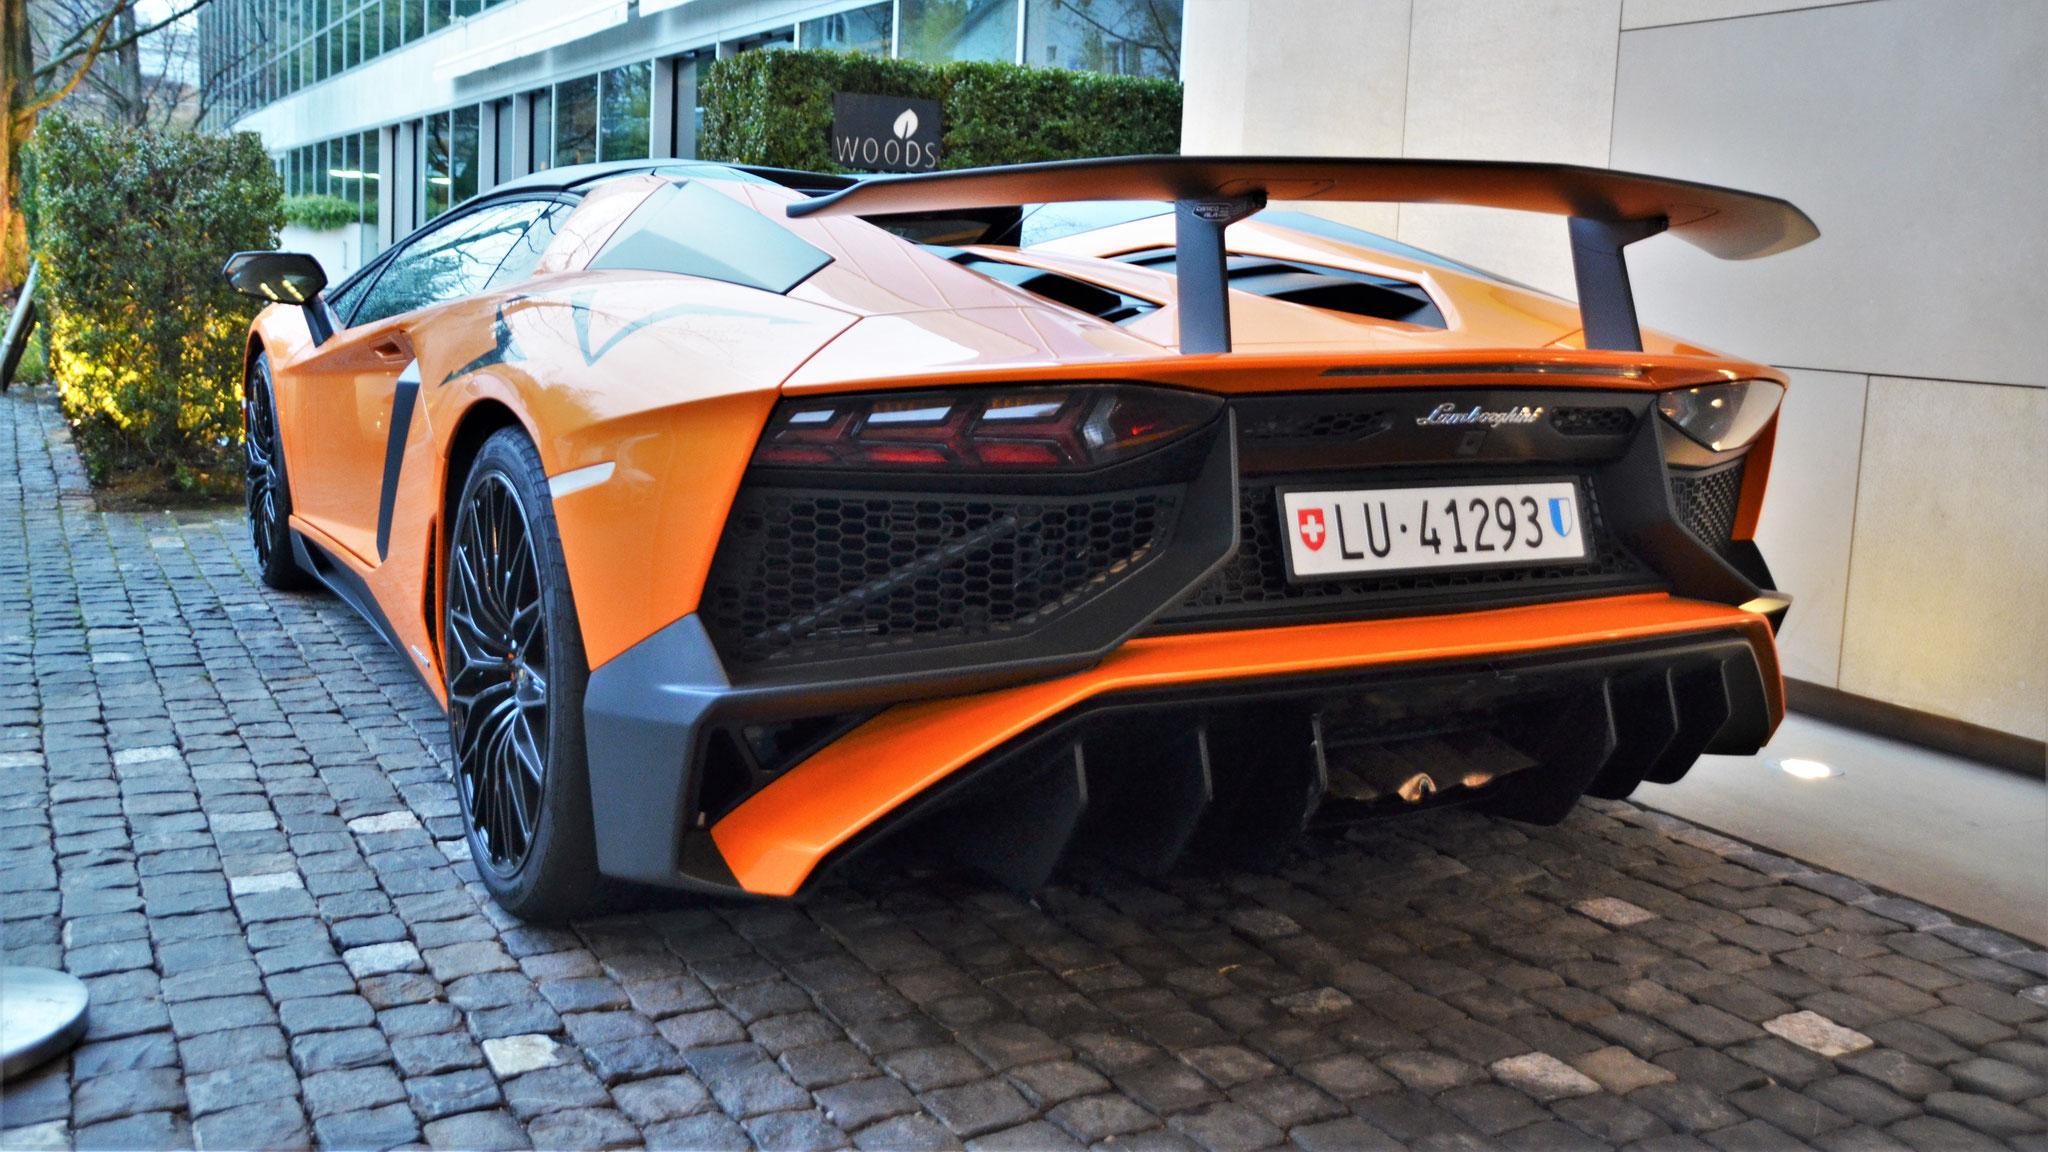 Lamborghini Aventador LP-750-4 SV Roadster - LU-41293 (CH)